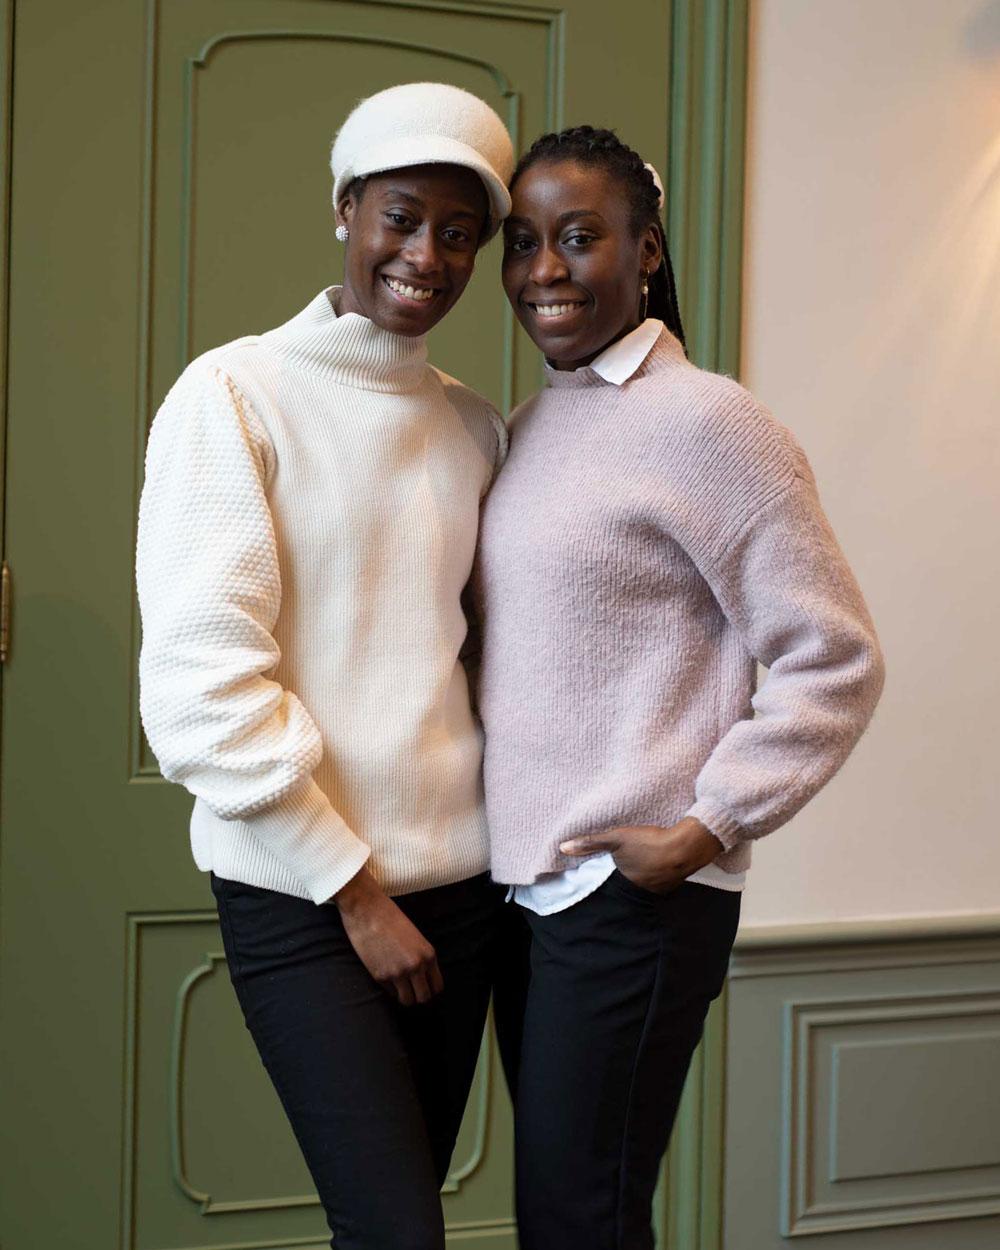 Nadia and Lemiza